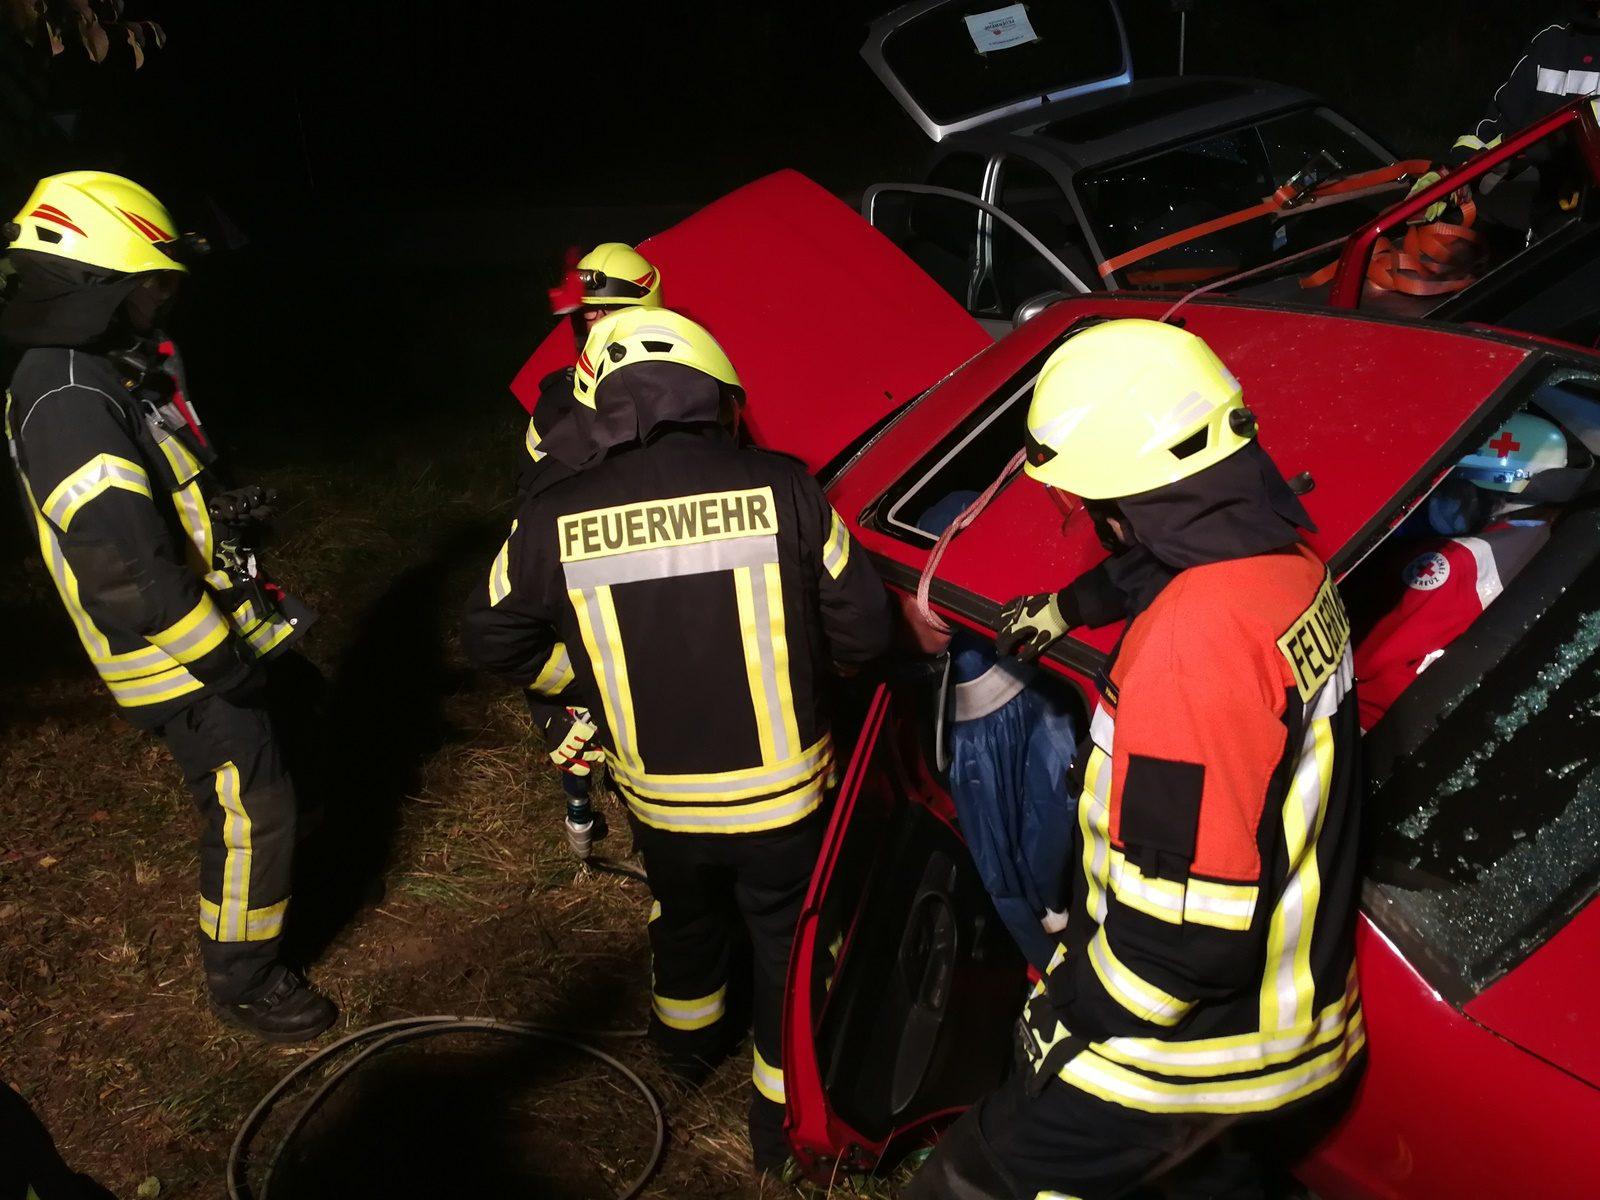 Mehrere Verletzte nach Verkehrsunfall